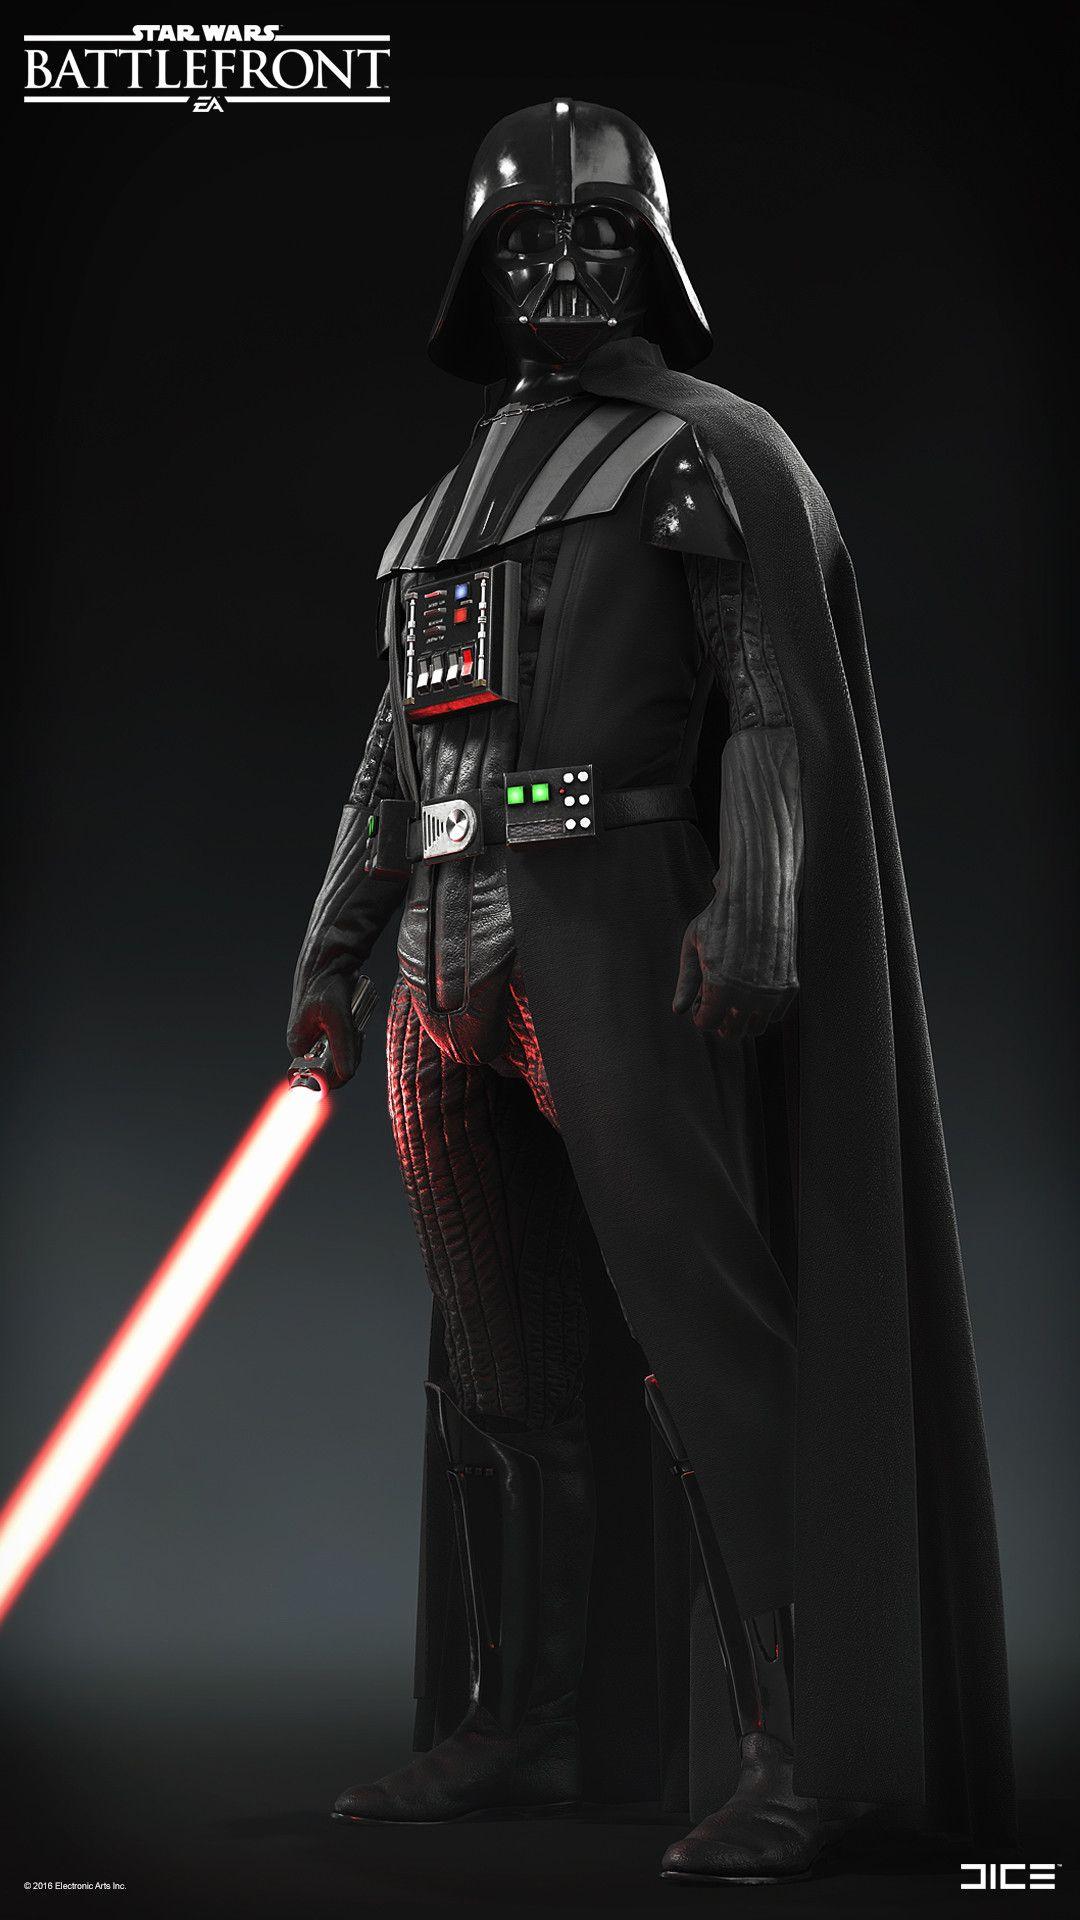 61cm x 91.5cm Dark Side PP34020-360 - Maxi Poster Star Wars Battlefront